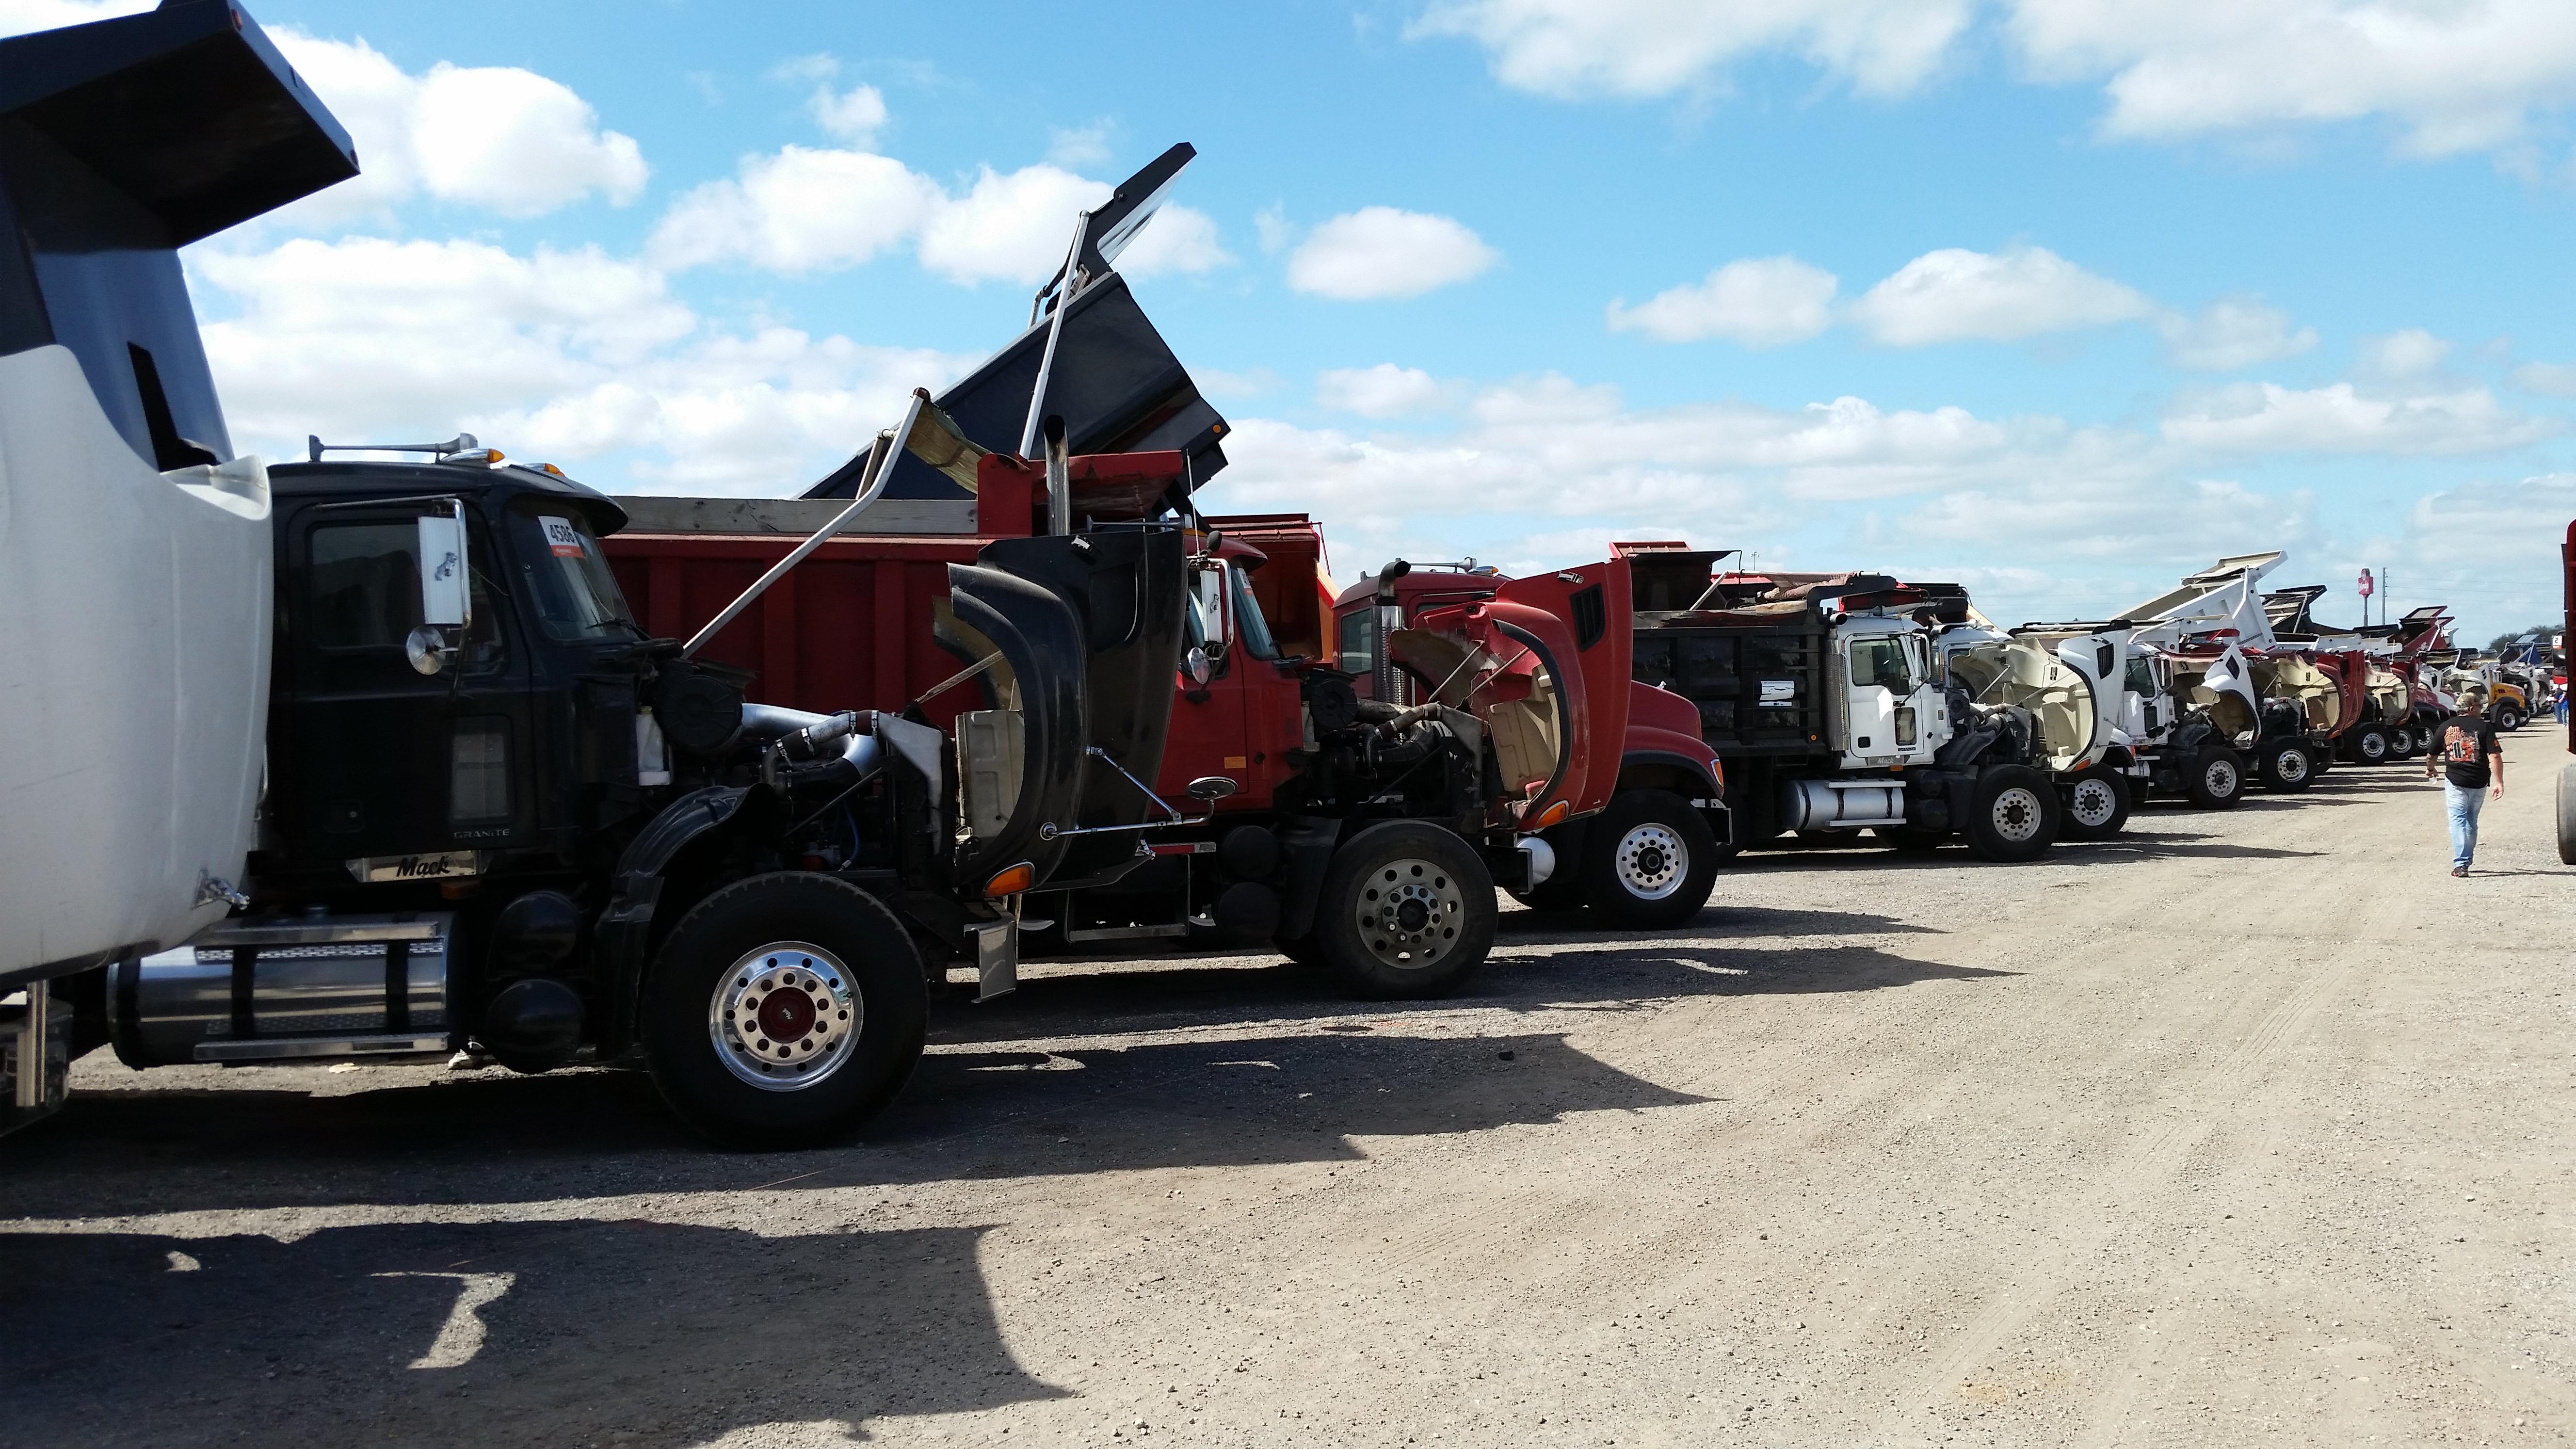 Row of Dump Trucks